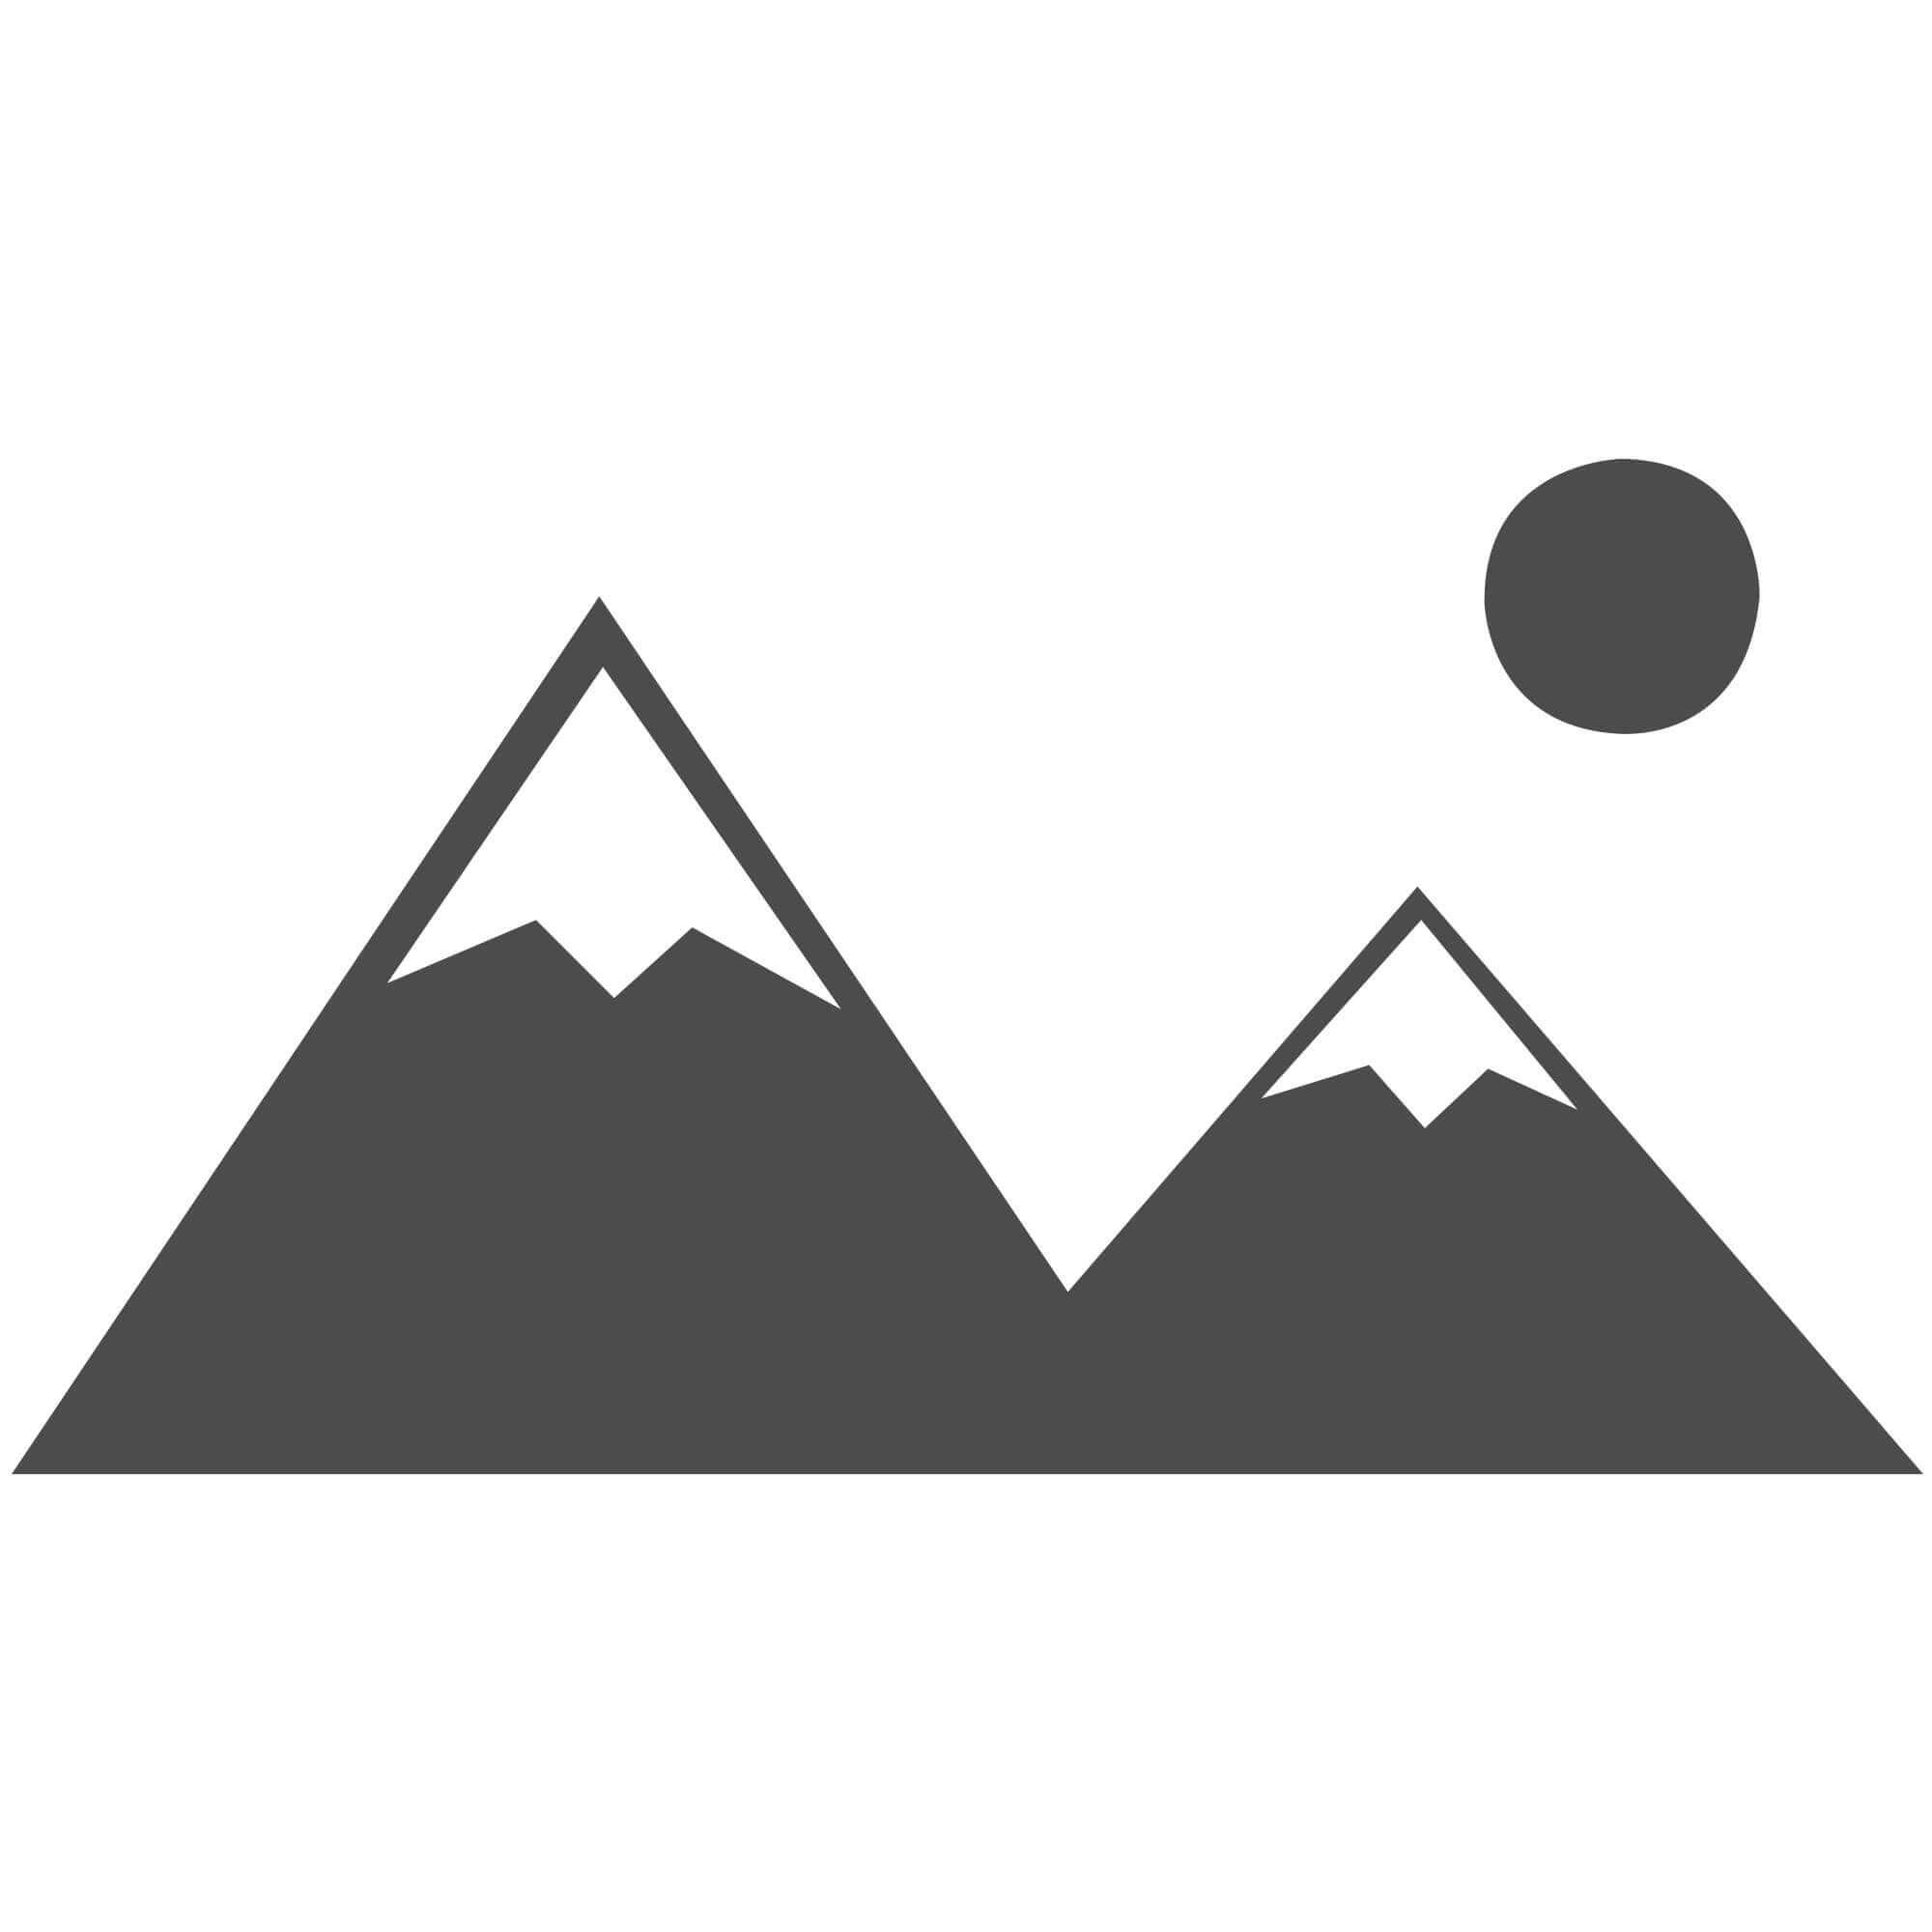 Stovax Studio 500 free standing woodburner #FPW